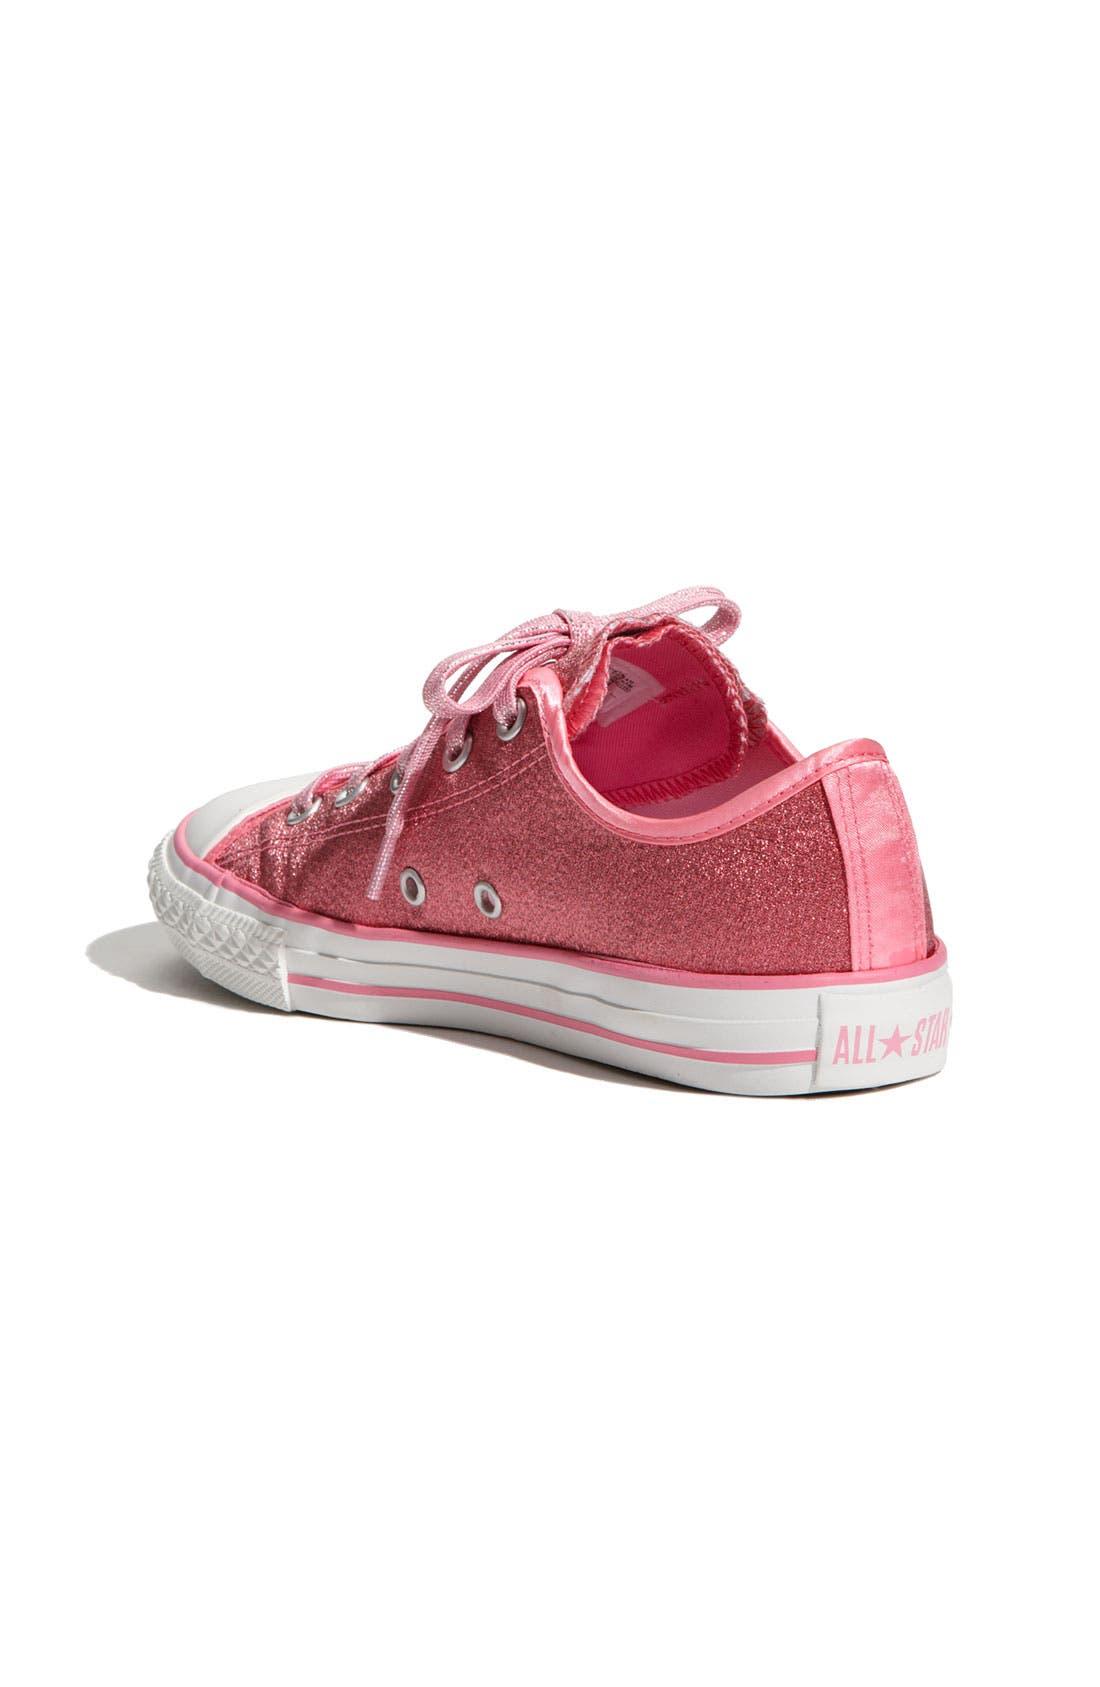 Alternate Image 2  - Converse Double Tongue Sneaker (Toddler, Little Kid & Big Kid)